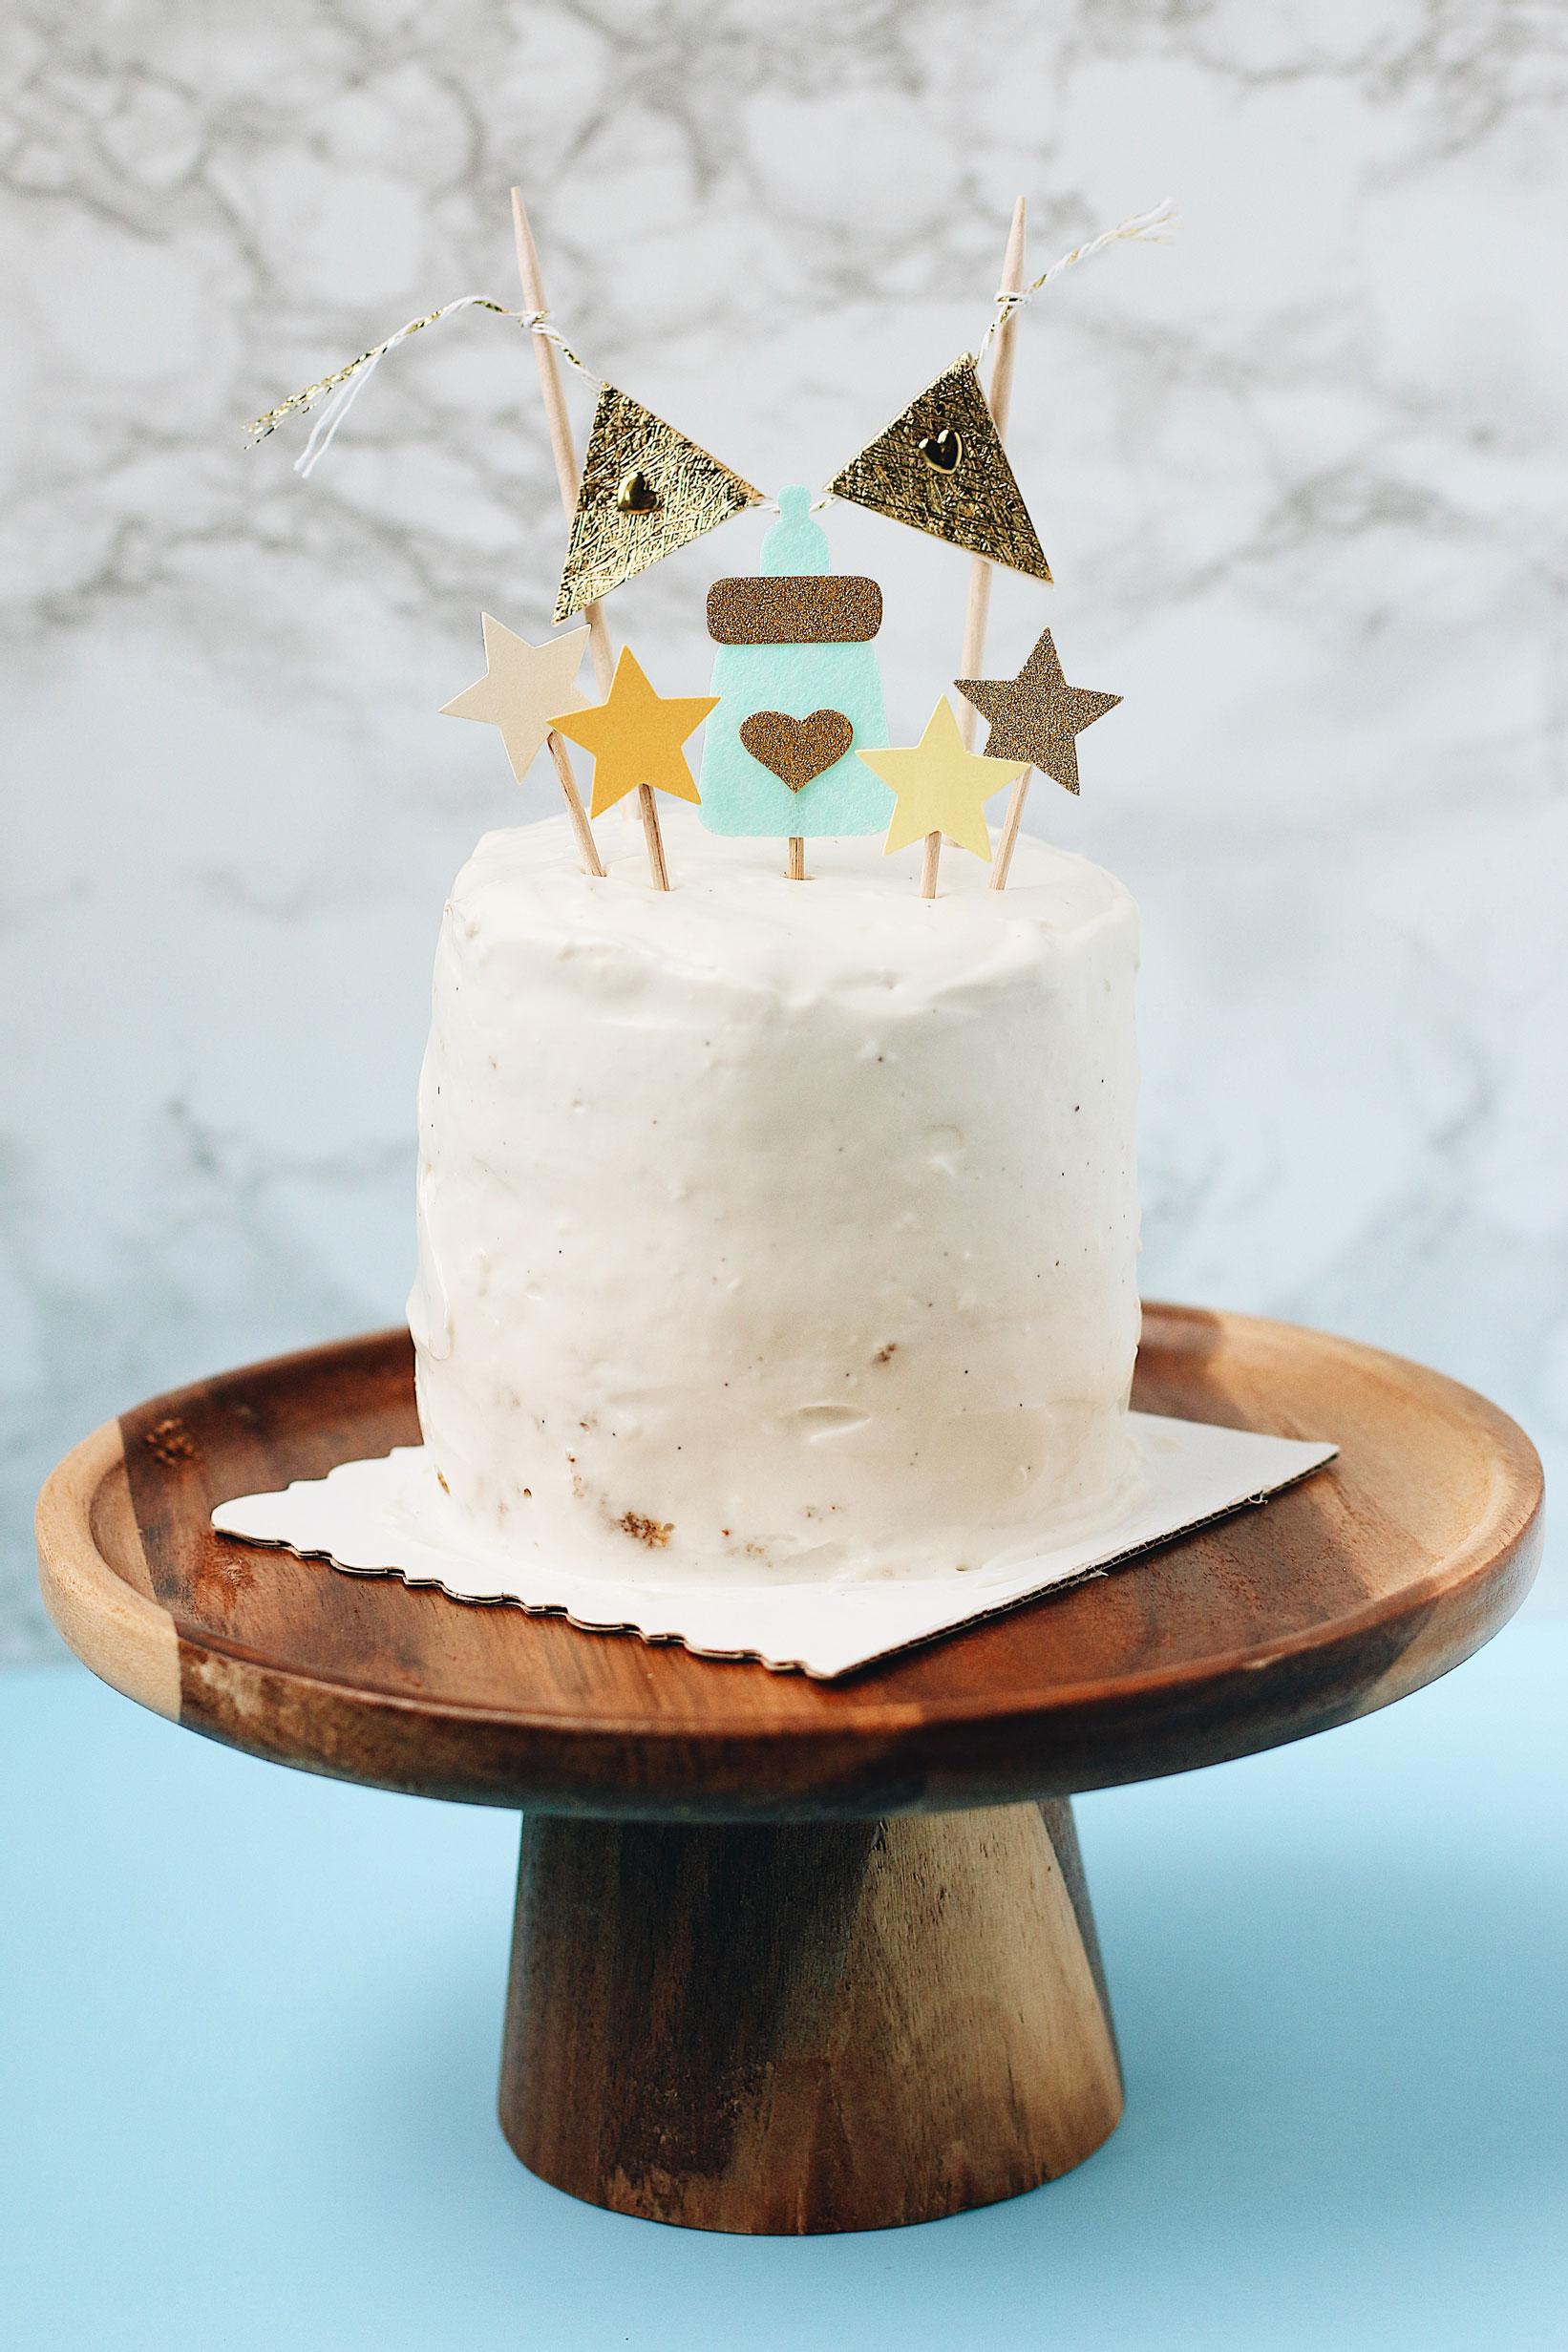 herbakinglab-little-croissant-first-birthday-DIY-cake-smash-photo-banana